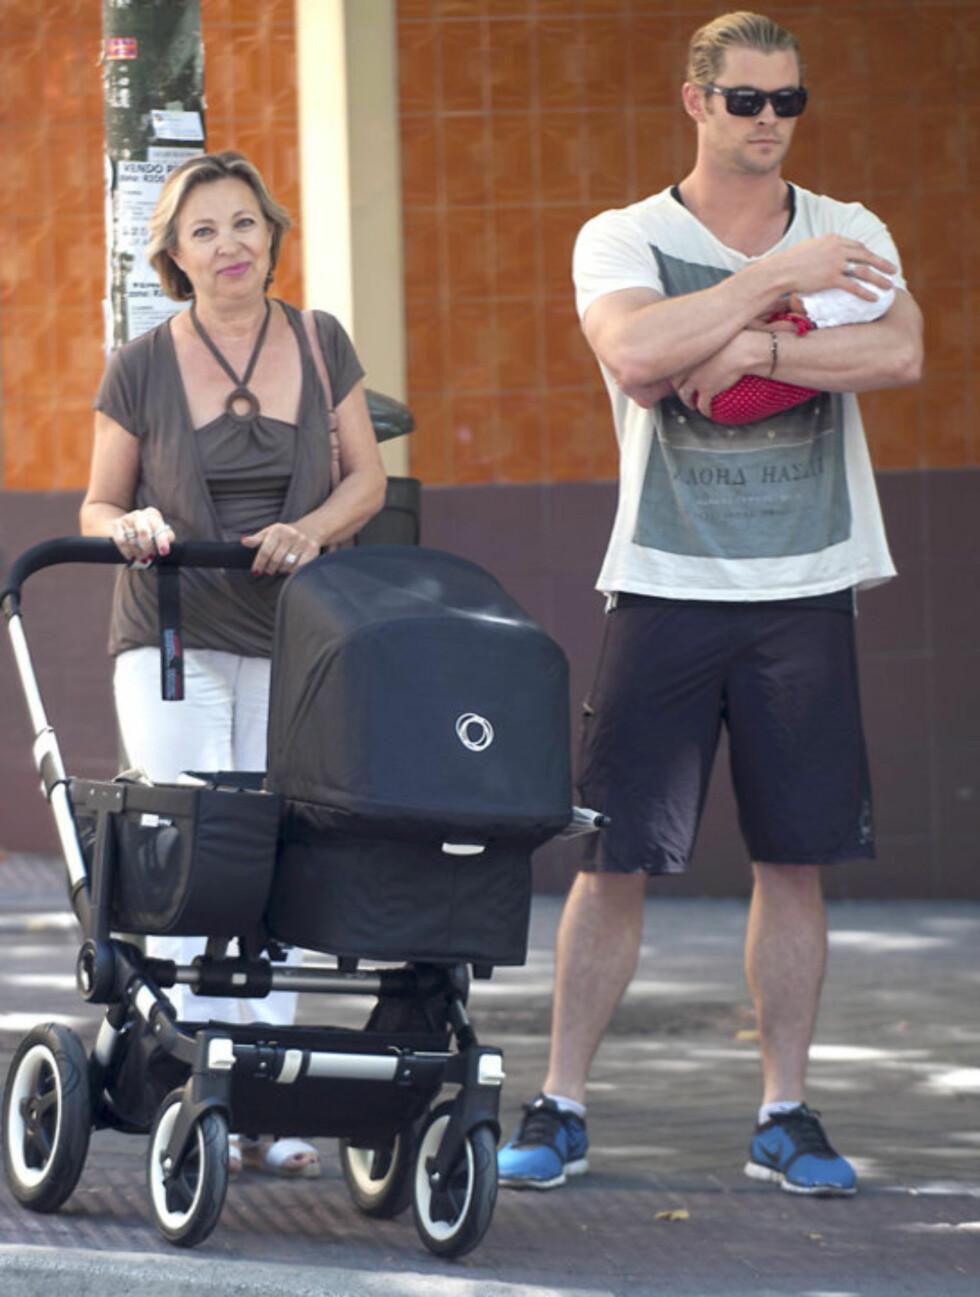 <strong>FAMILIETUR:</strong> Også Chris Hemsworths svigermor, Cristina Medianu, var med på spaserturen. Hun måtte tilsynelatende nøye seg med å trille tom vogn mens filmstjernen holdt godt på datteren sin.  Foto: © GTRESONLINE